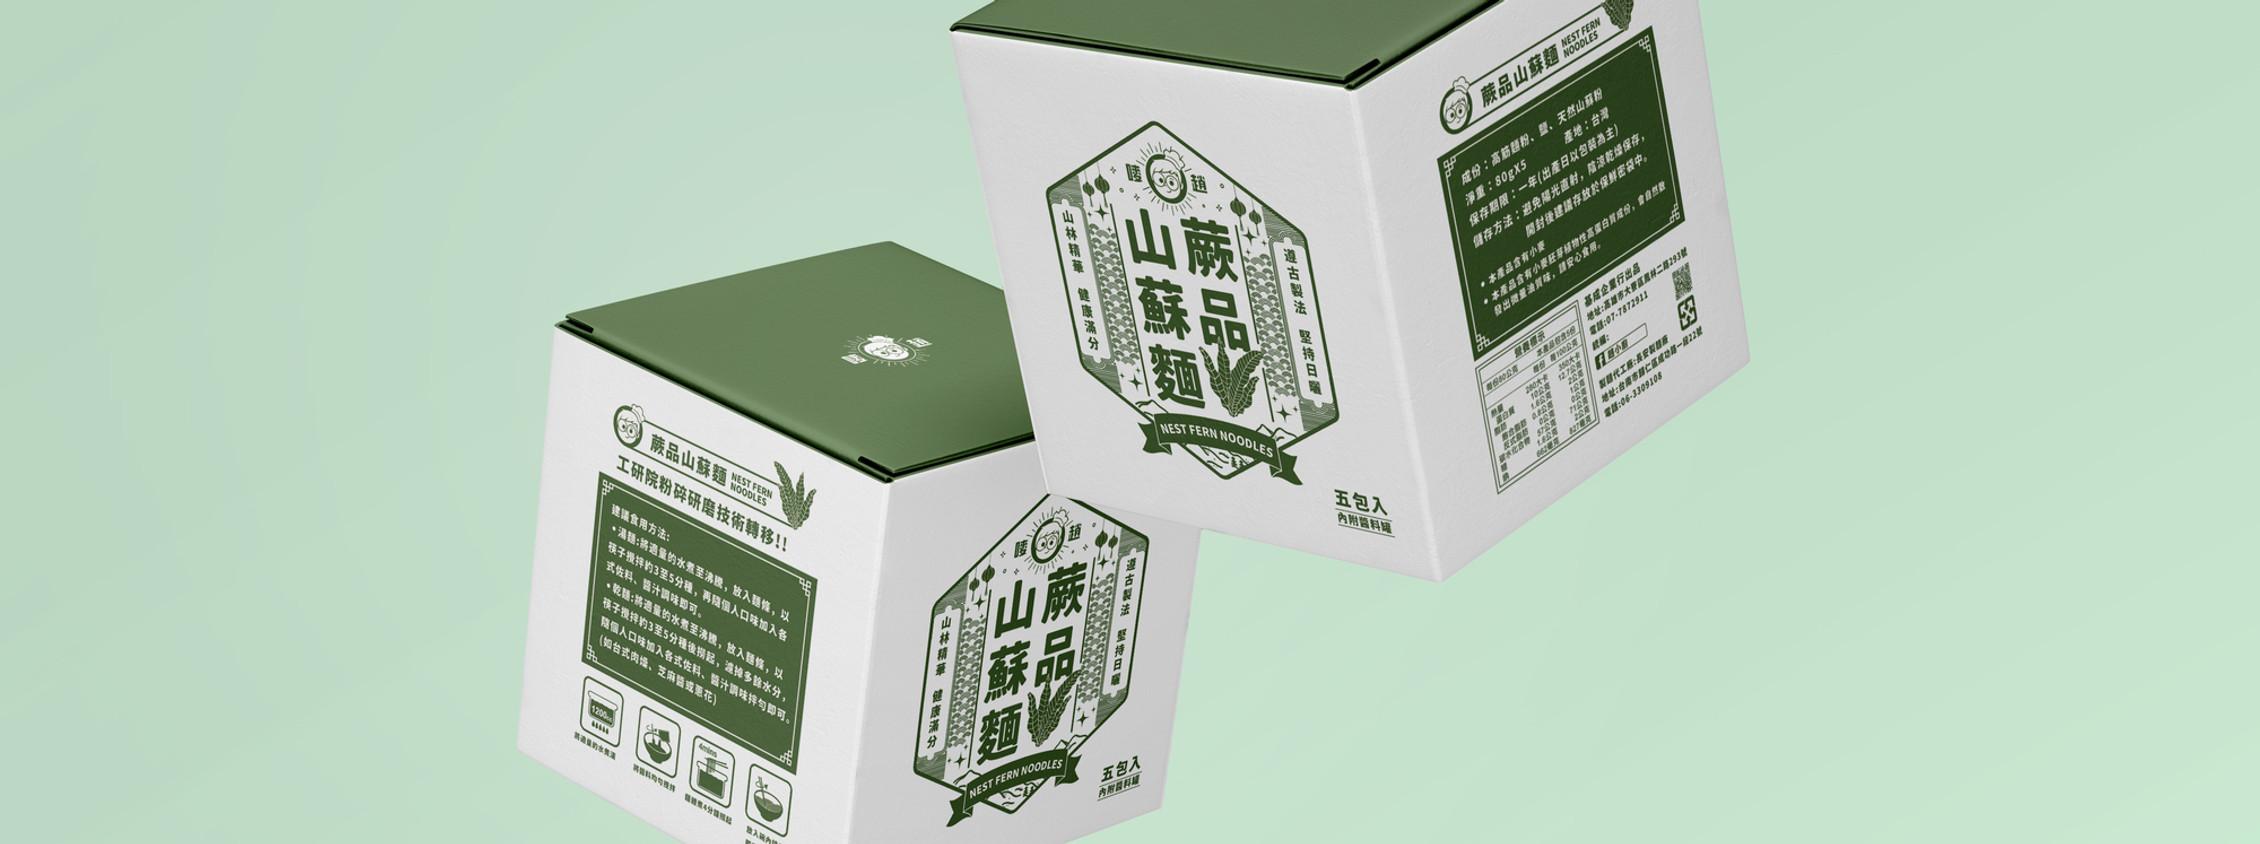 Box_Mockups_OK_2.jpg